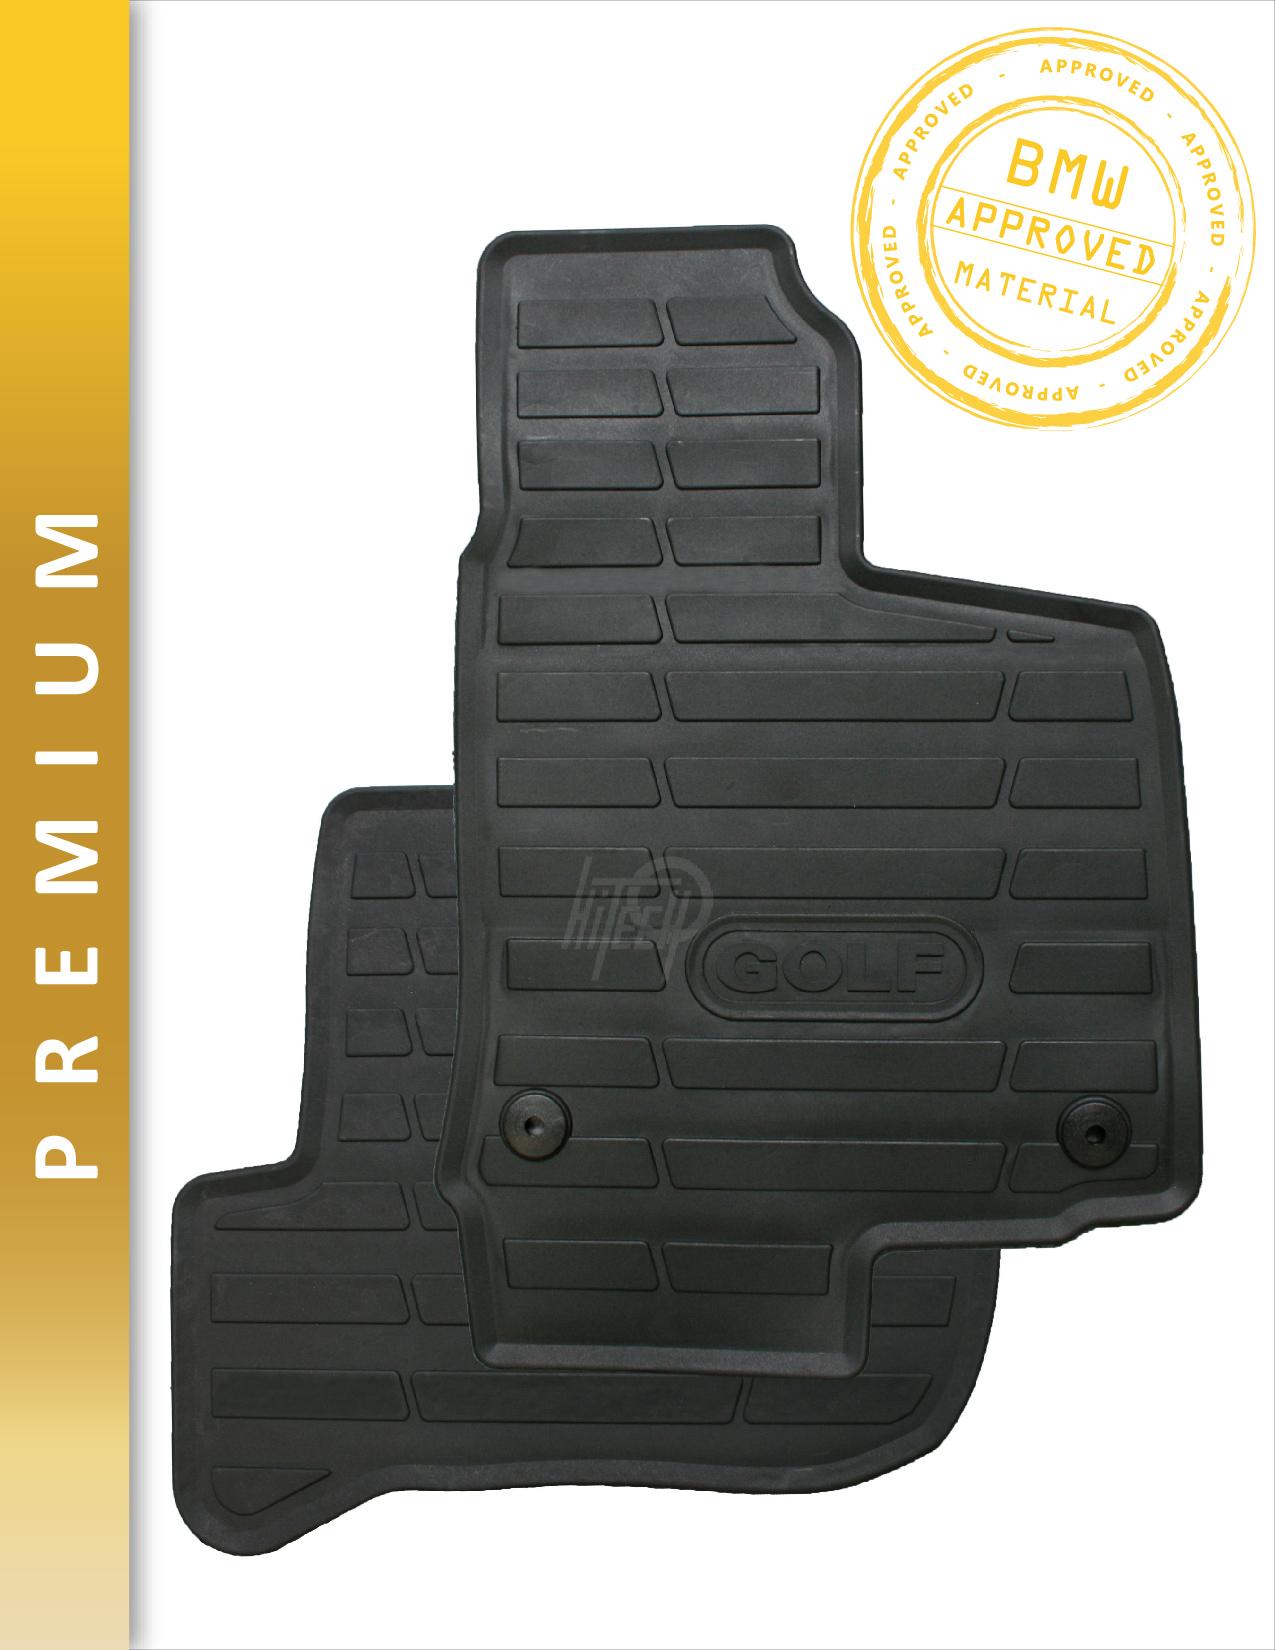 Genuine Hitech Vw Golf Fully Tailored Premium Rubber Mats